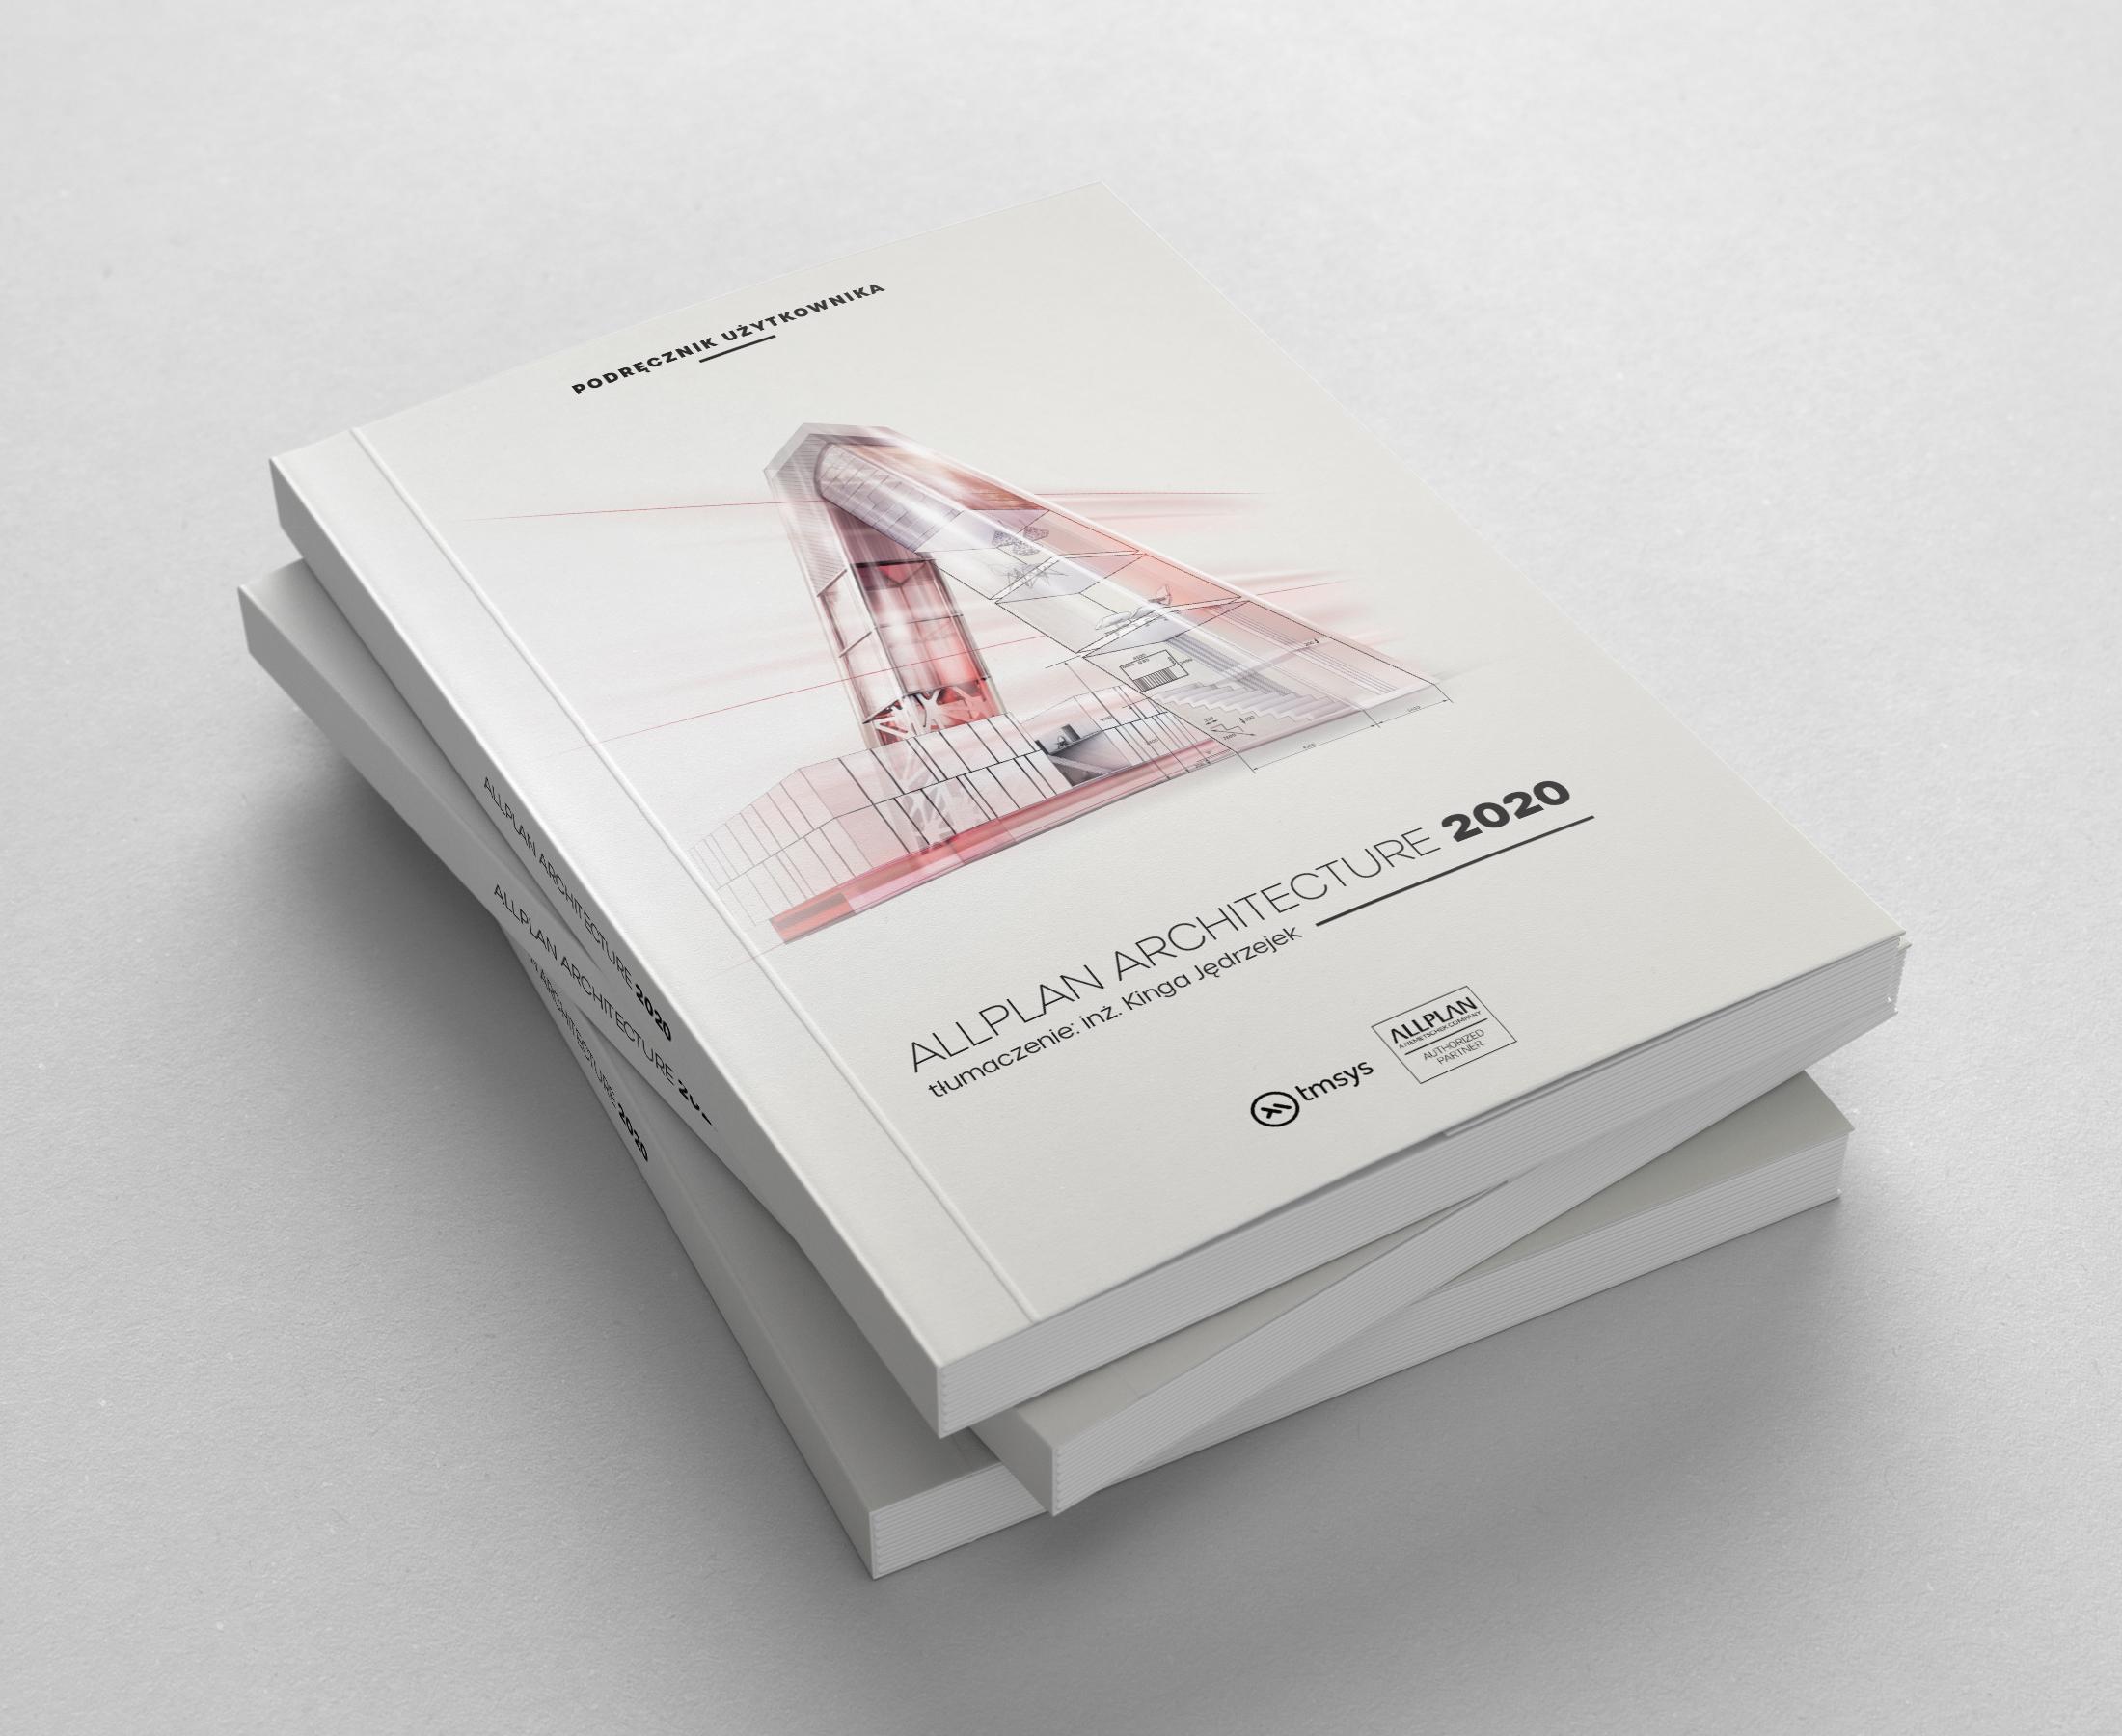 Podręcznik Allplan Architecture 2020 już jest!